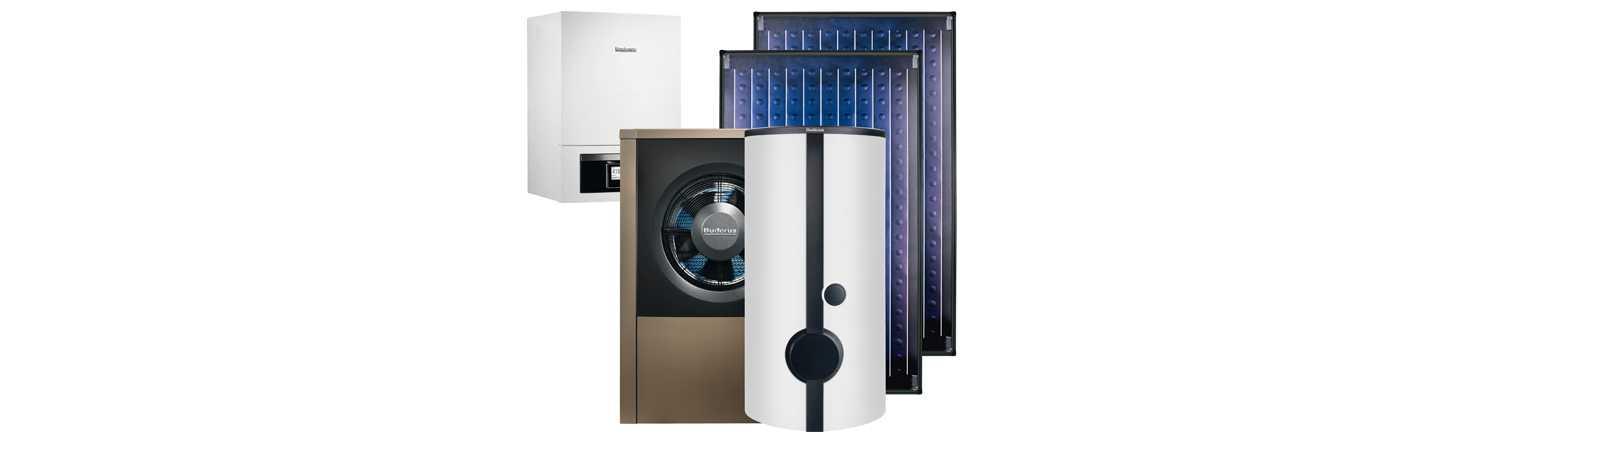 solar w rmepumpe die kombination mit solarthermie. Black Bedroom Furniture Sets. Home Design Ideas